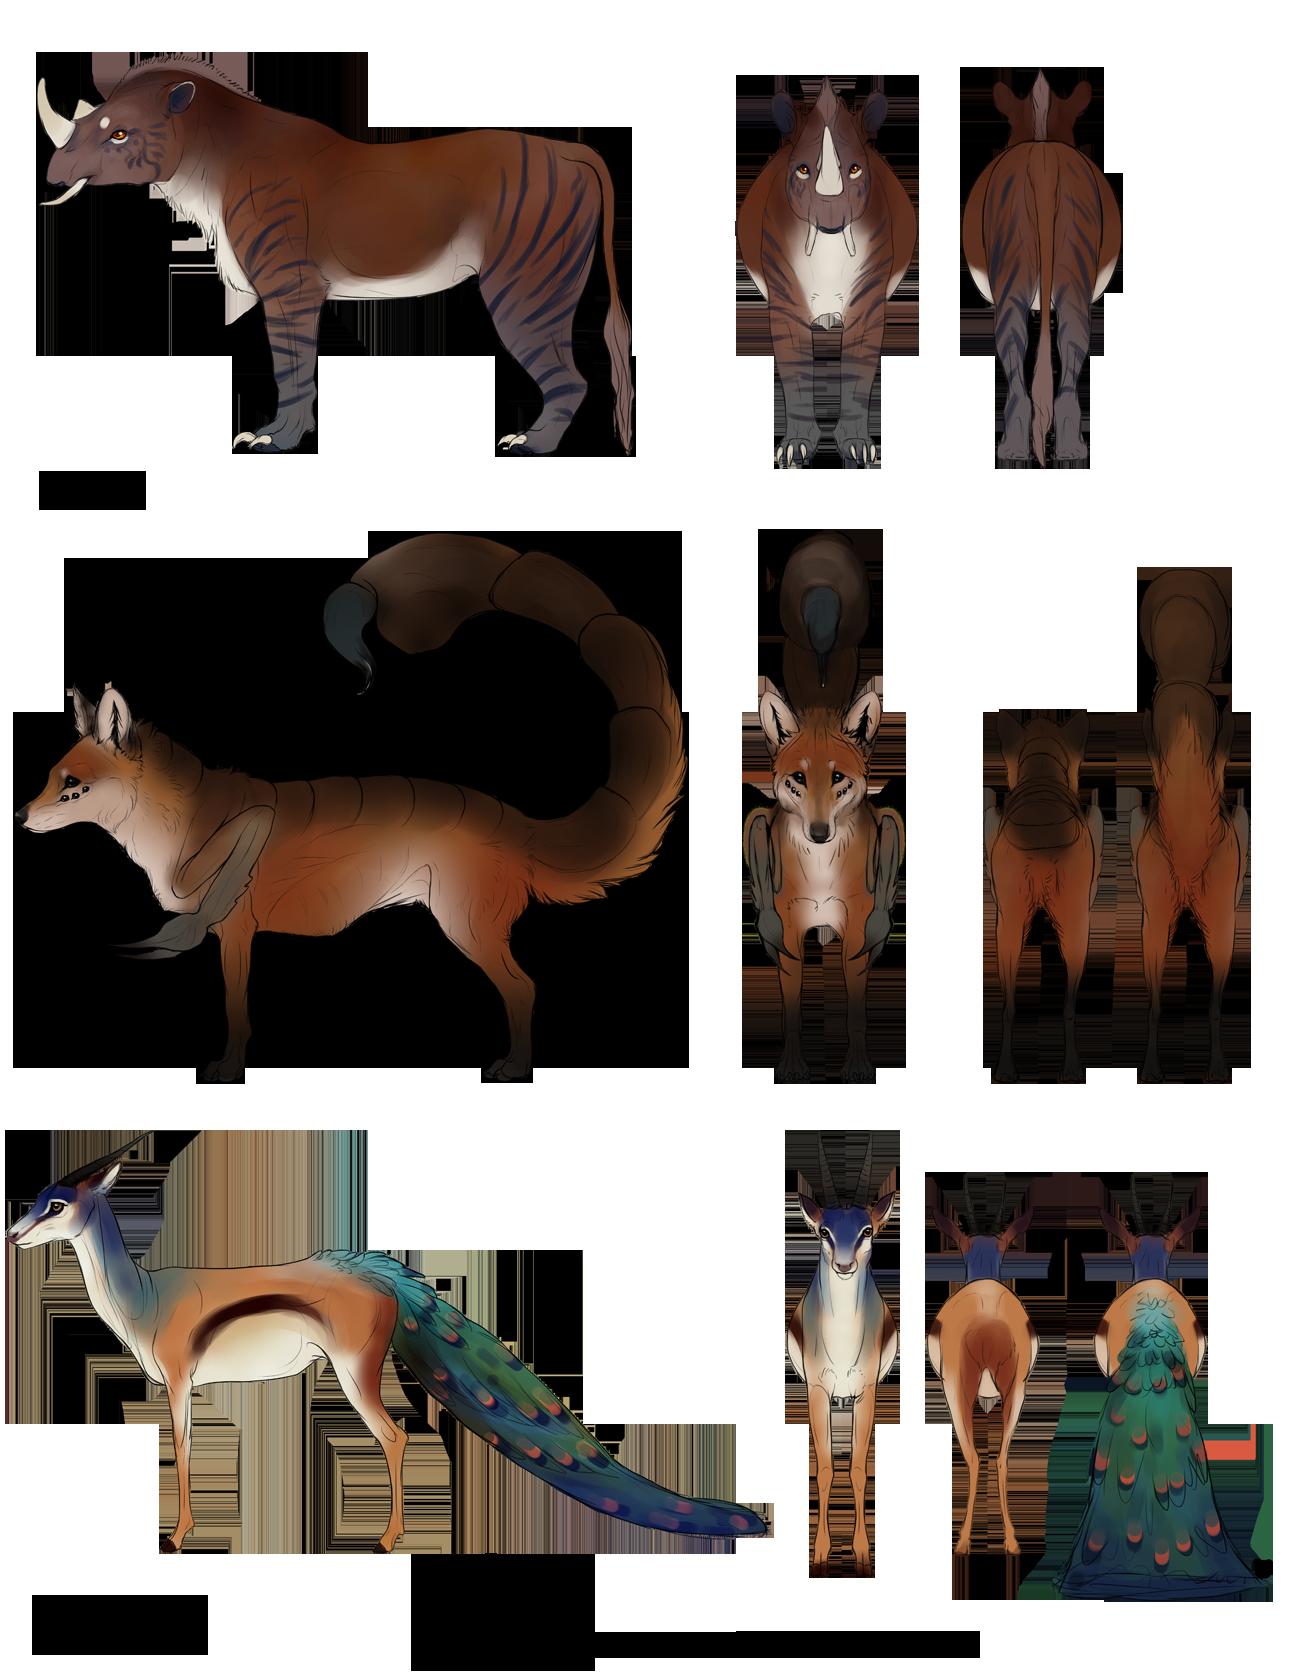 Worksheet Mythical Creatur mythical creatures 3 commission by cobravenom deviantart com on deviantart